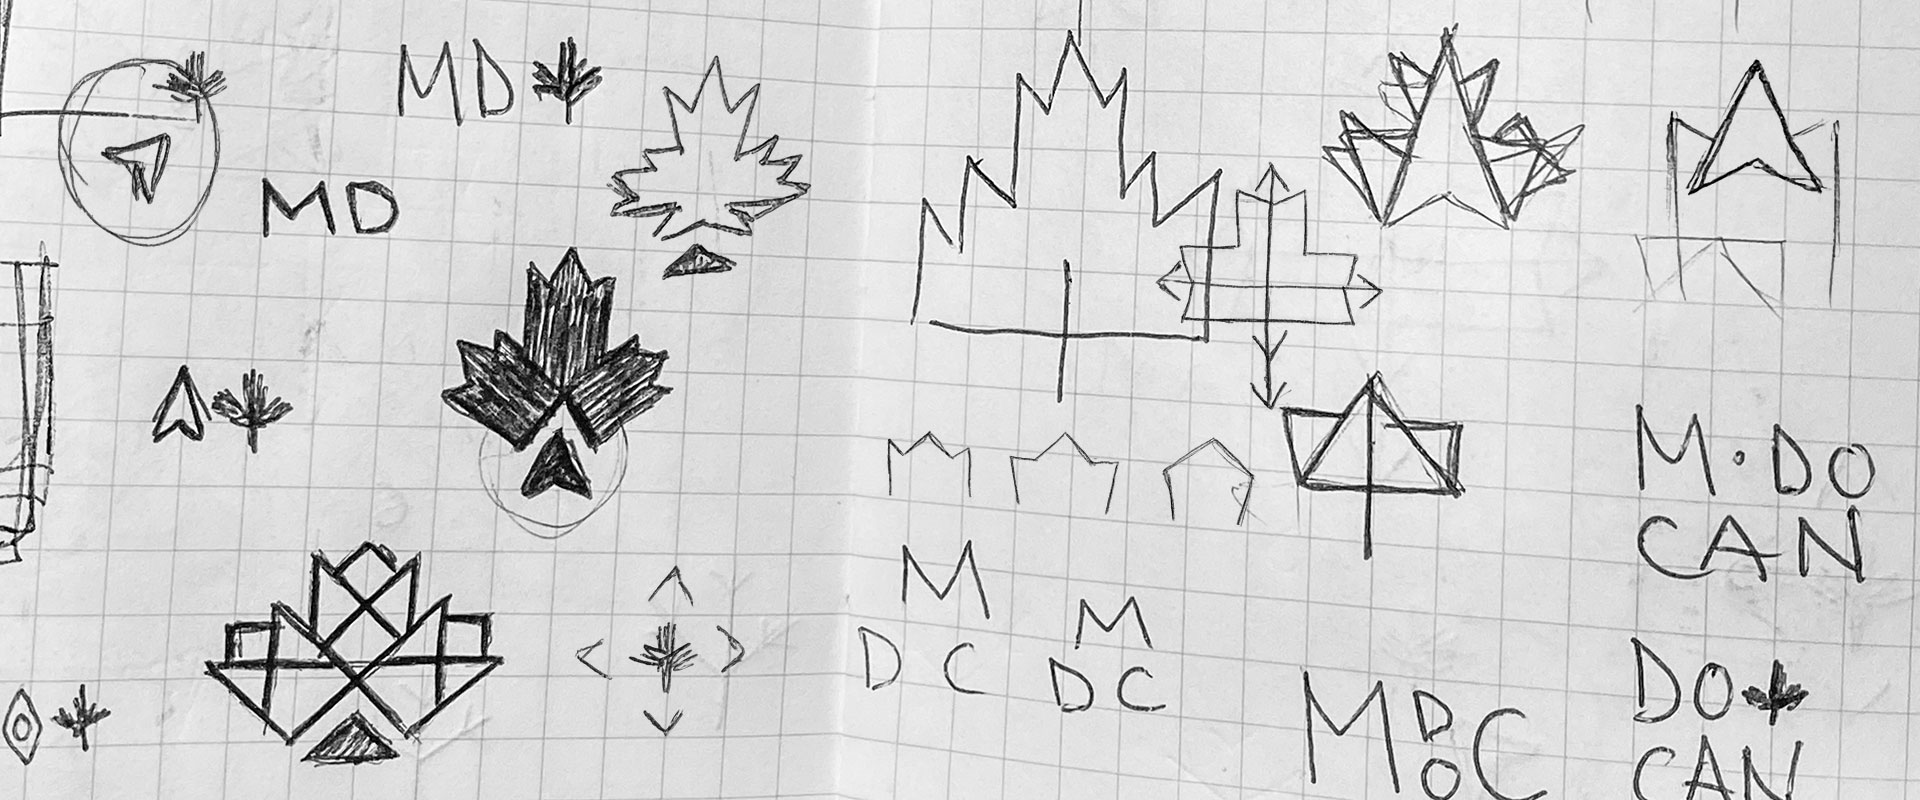 must-do-canada-logo-sketches